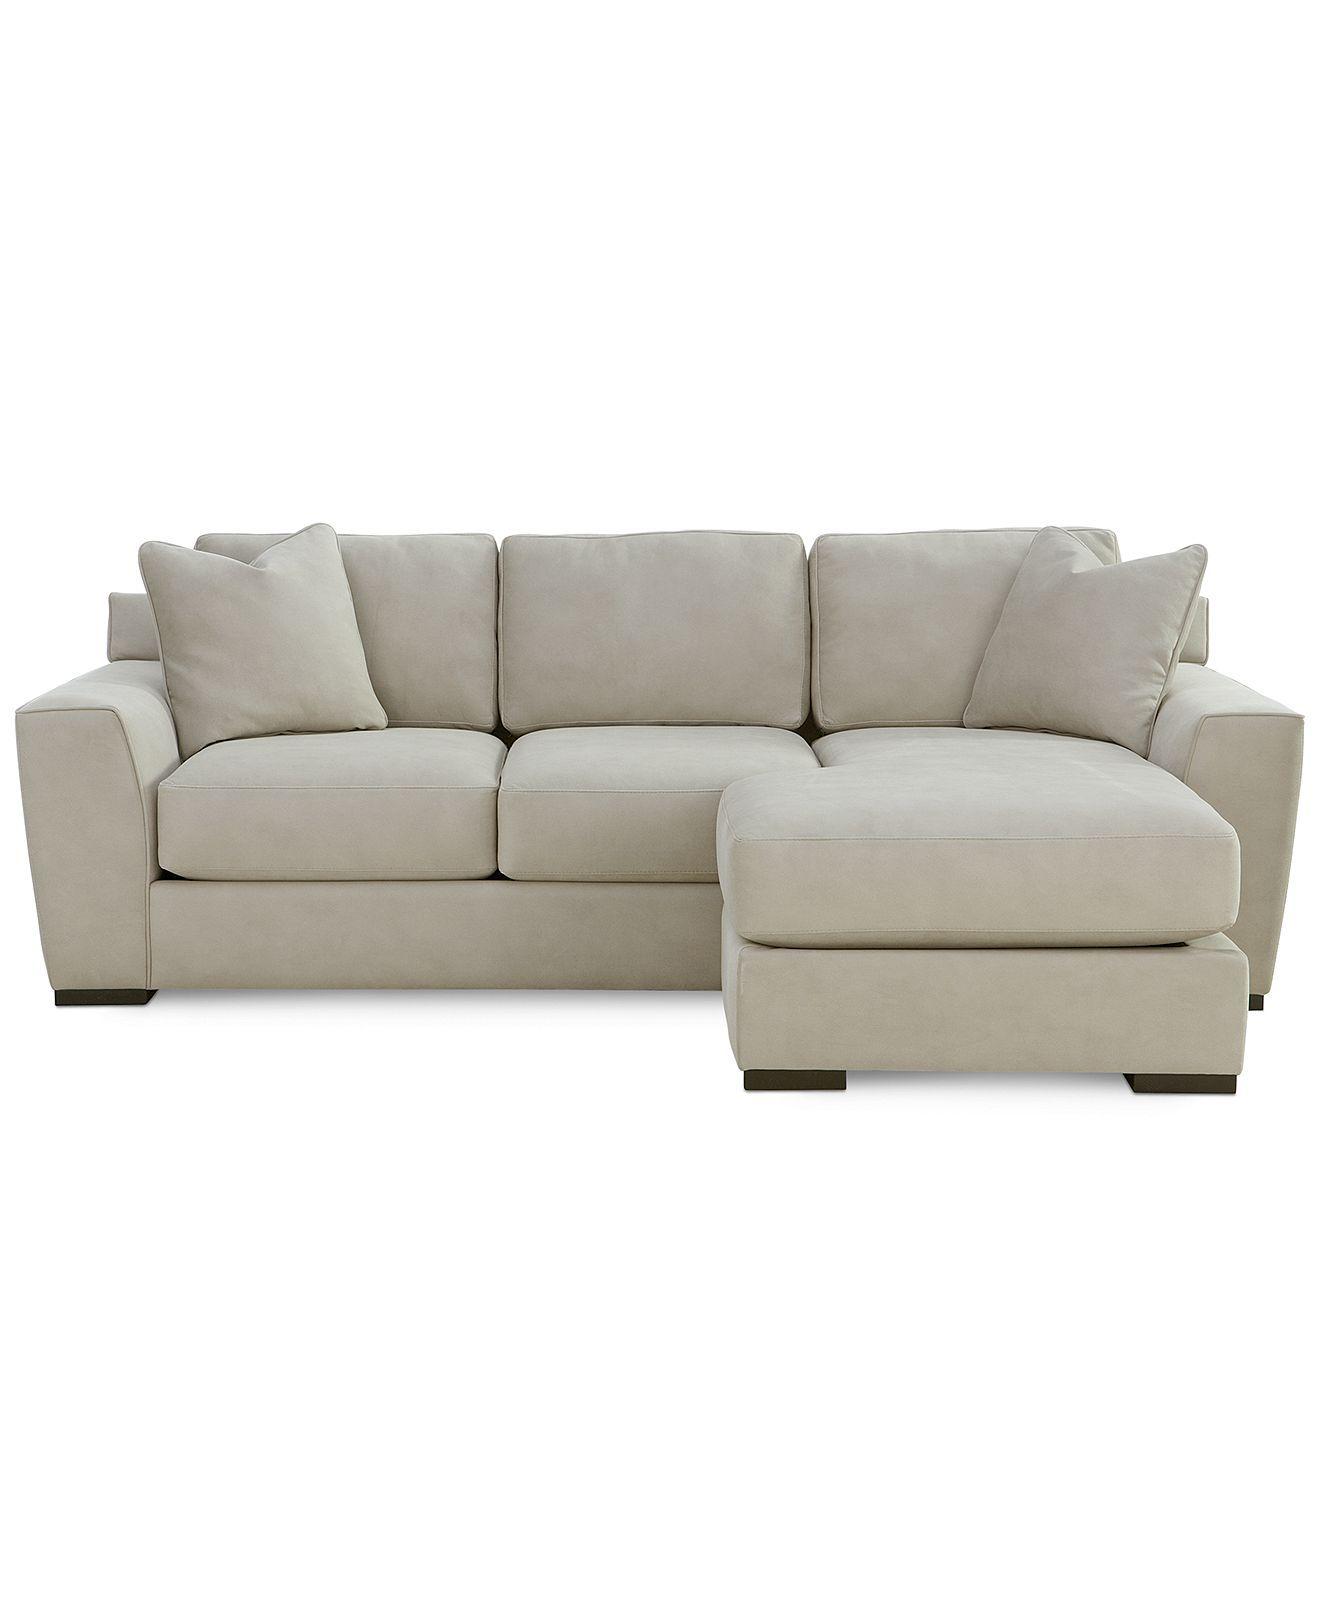 Chaise Sofa Loui Fabric Sectional Sofa Piece W X D X Sofas OnlineFurniture